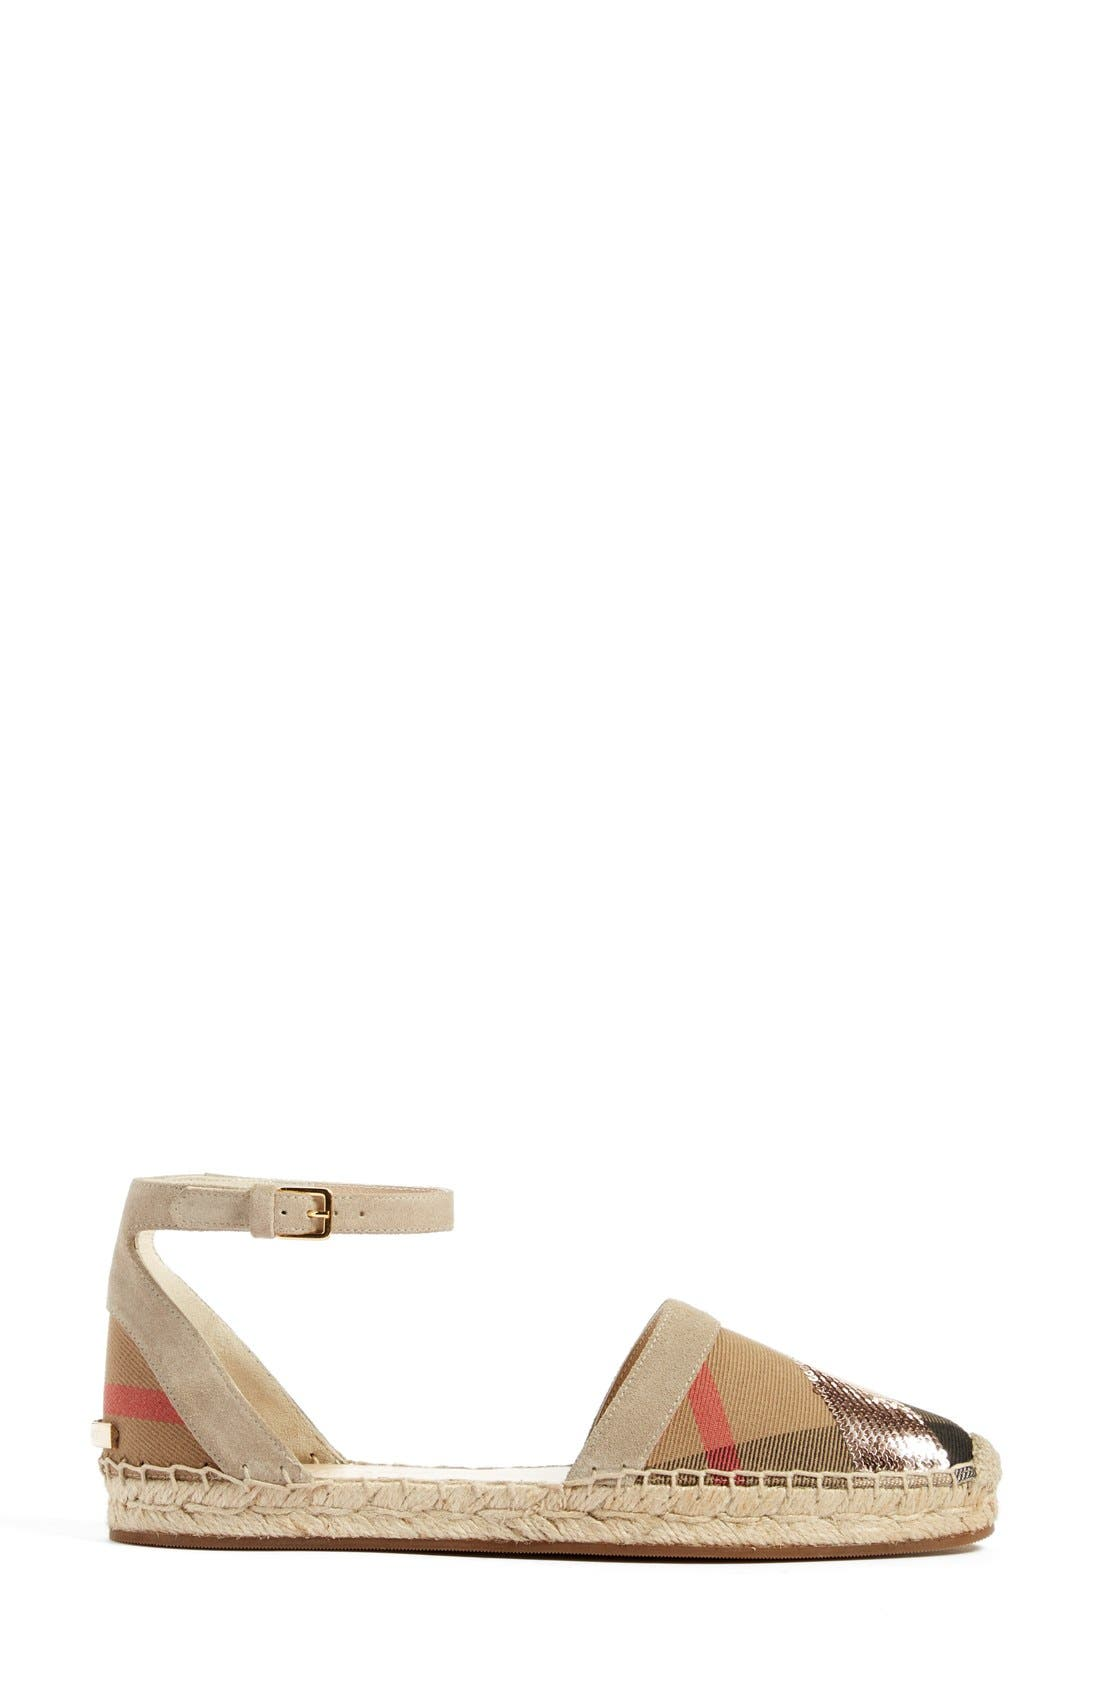 'Abbingdon' Ankle Strap Espadrille Sandal,                             Alternate thumbnail 4, color,                             Grey/ Pale Pink